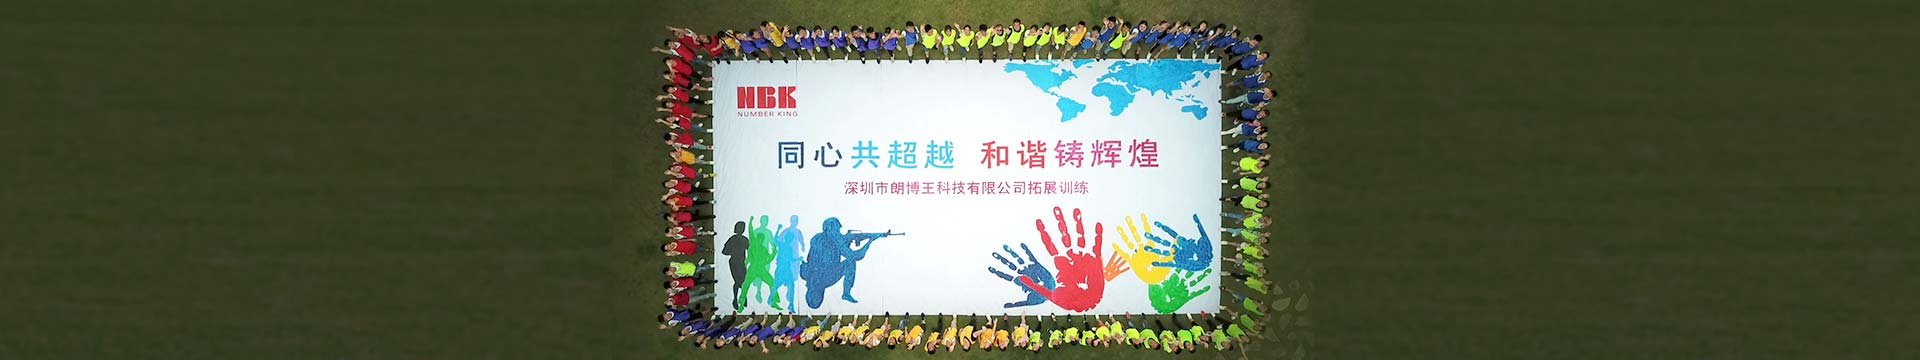 Shenzhen Number King Tech Co., Ltd.